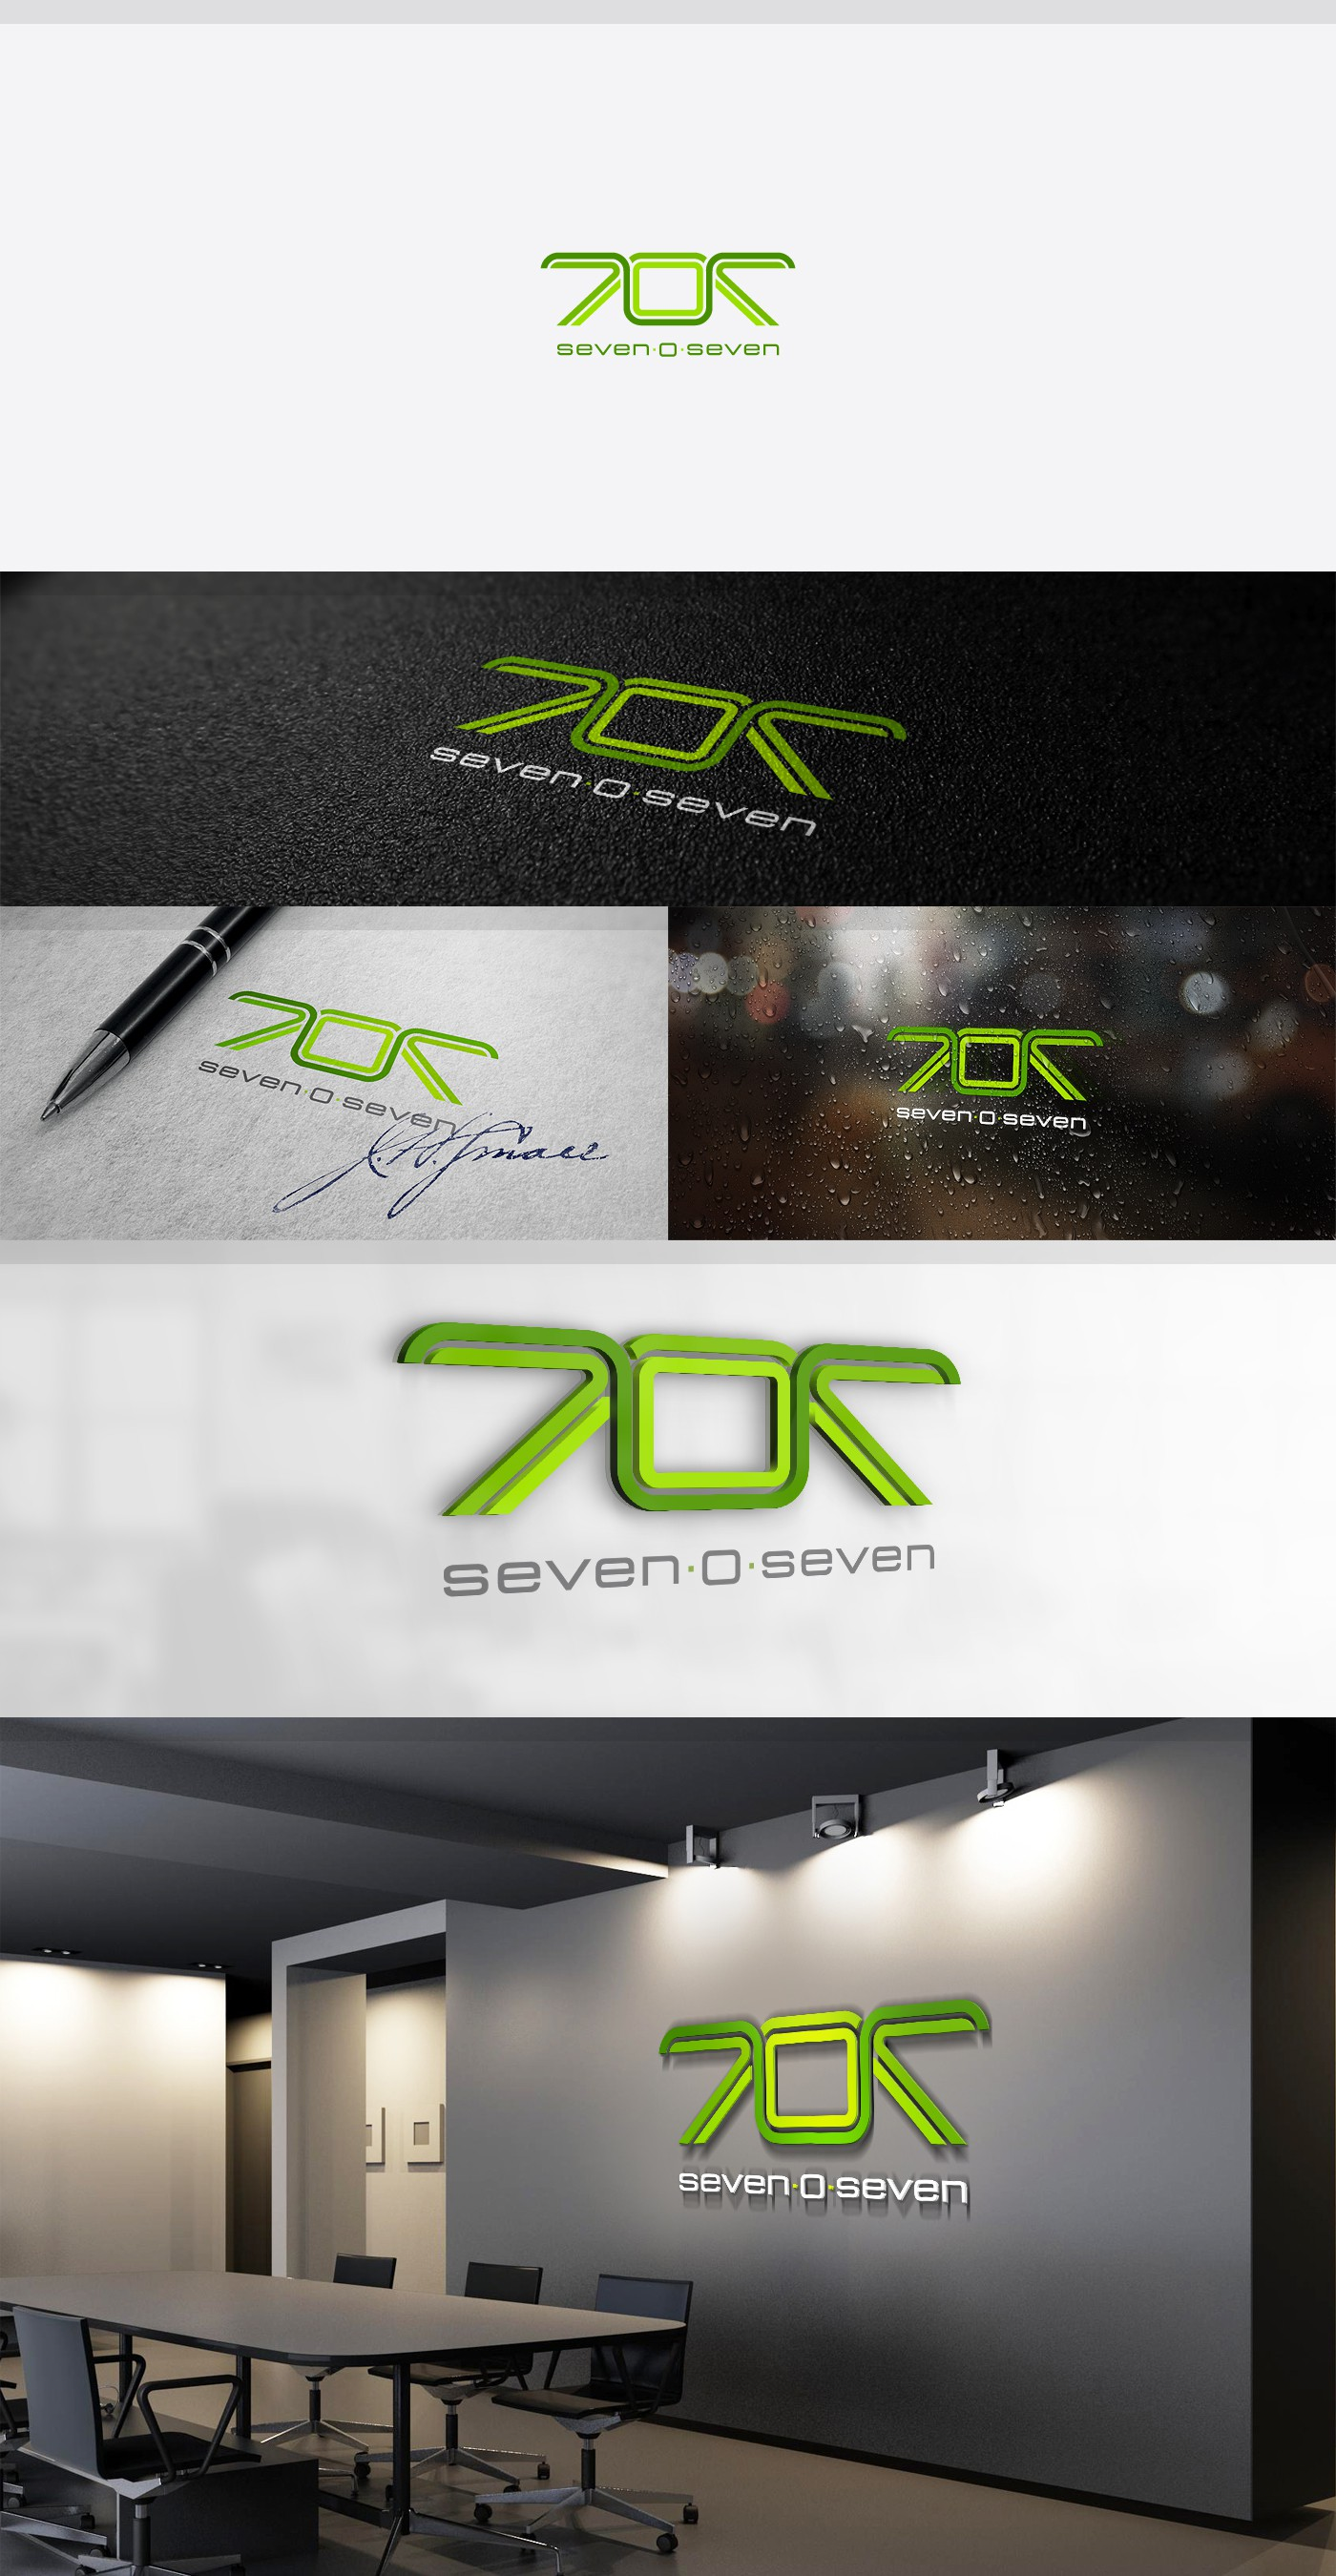 707 logo (2)